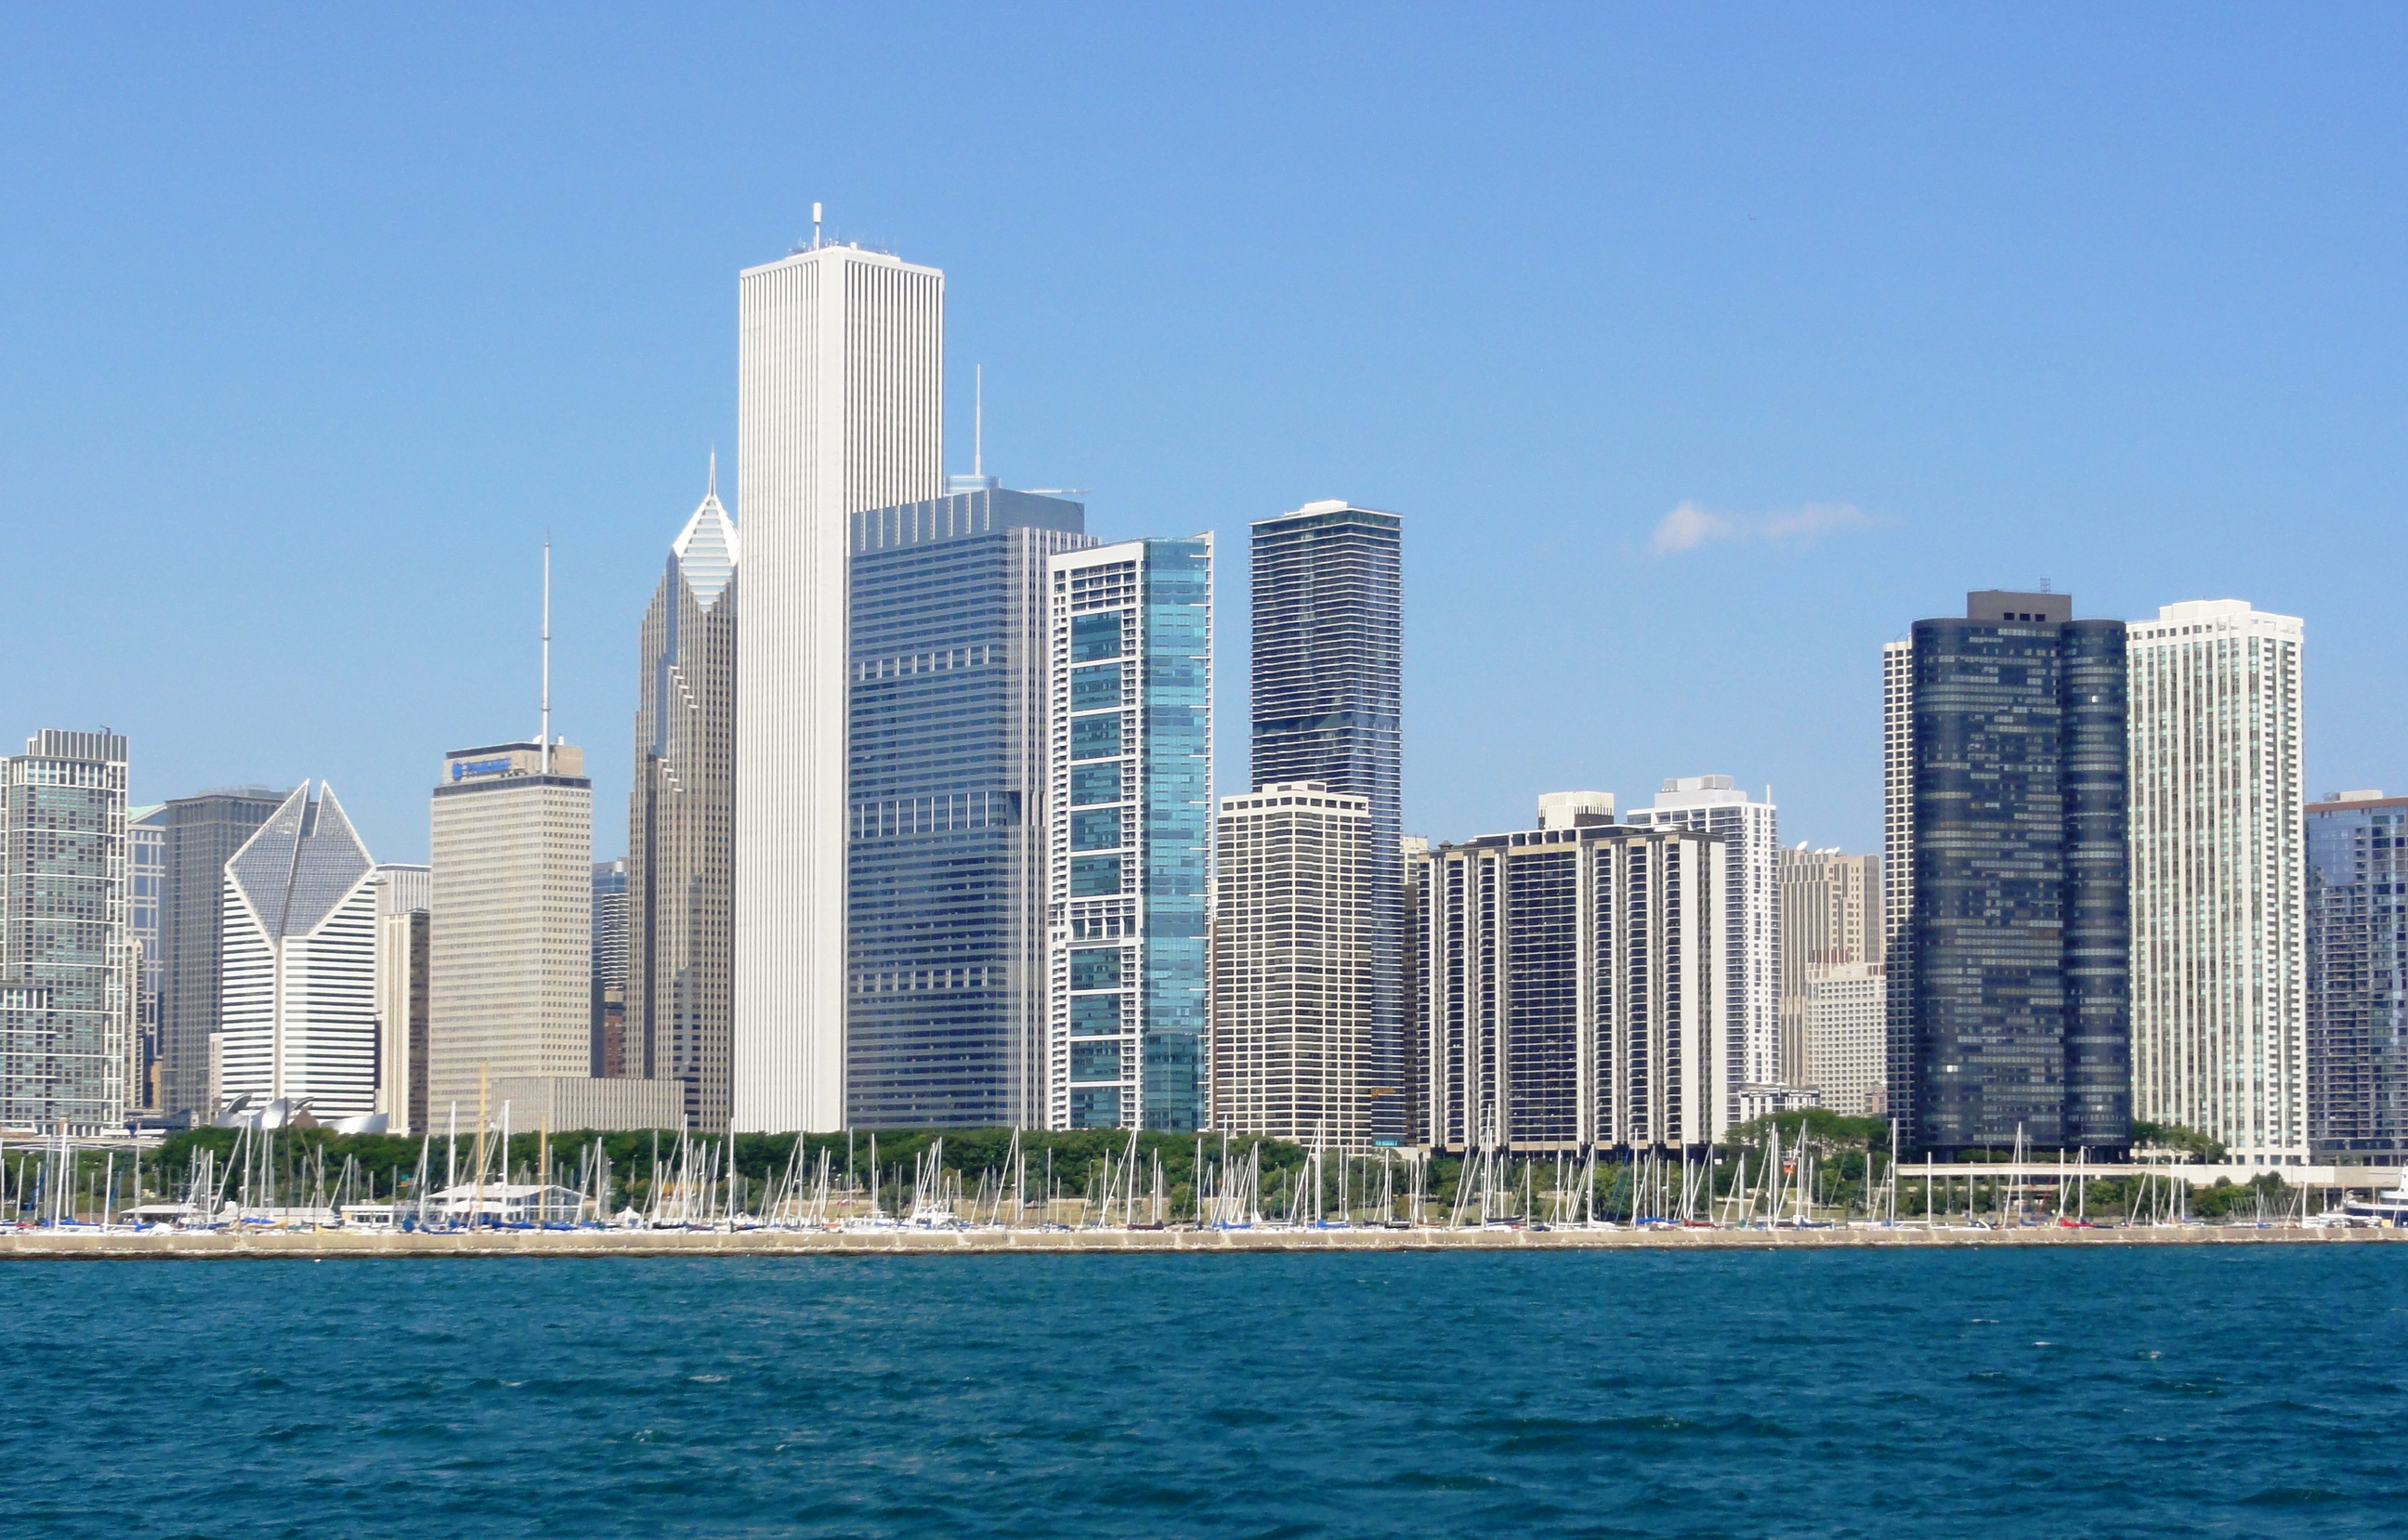 Police Officer Wallpaper Hd August 27 September 2 2010 Chicago Illinois 41 8861 087